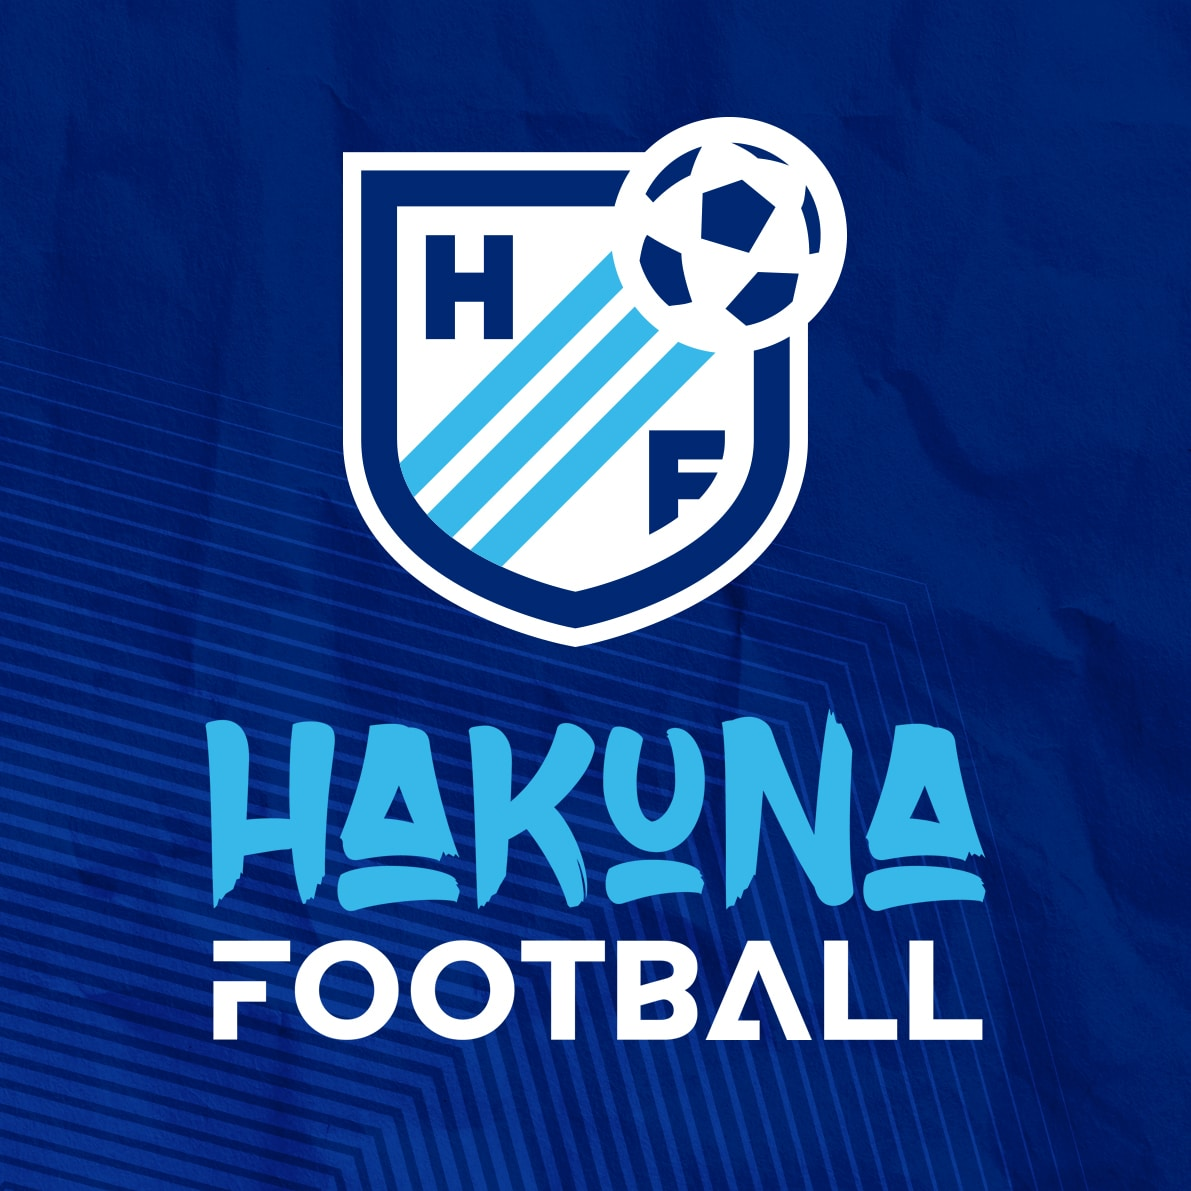 C.E Hakuna